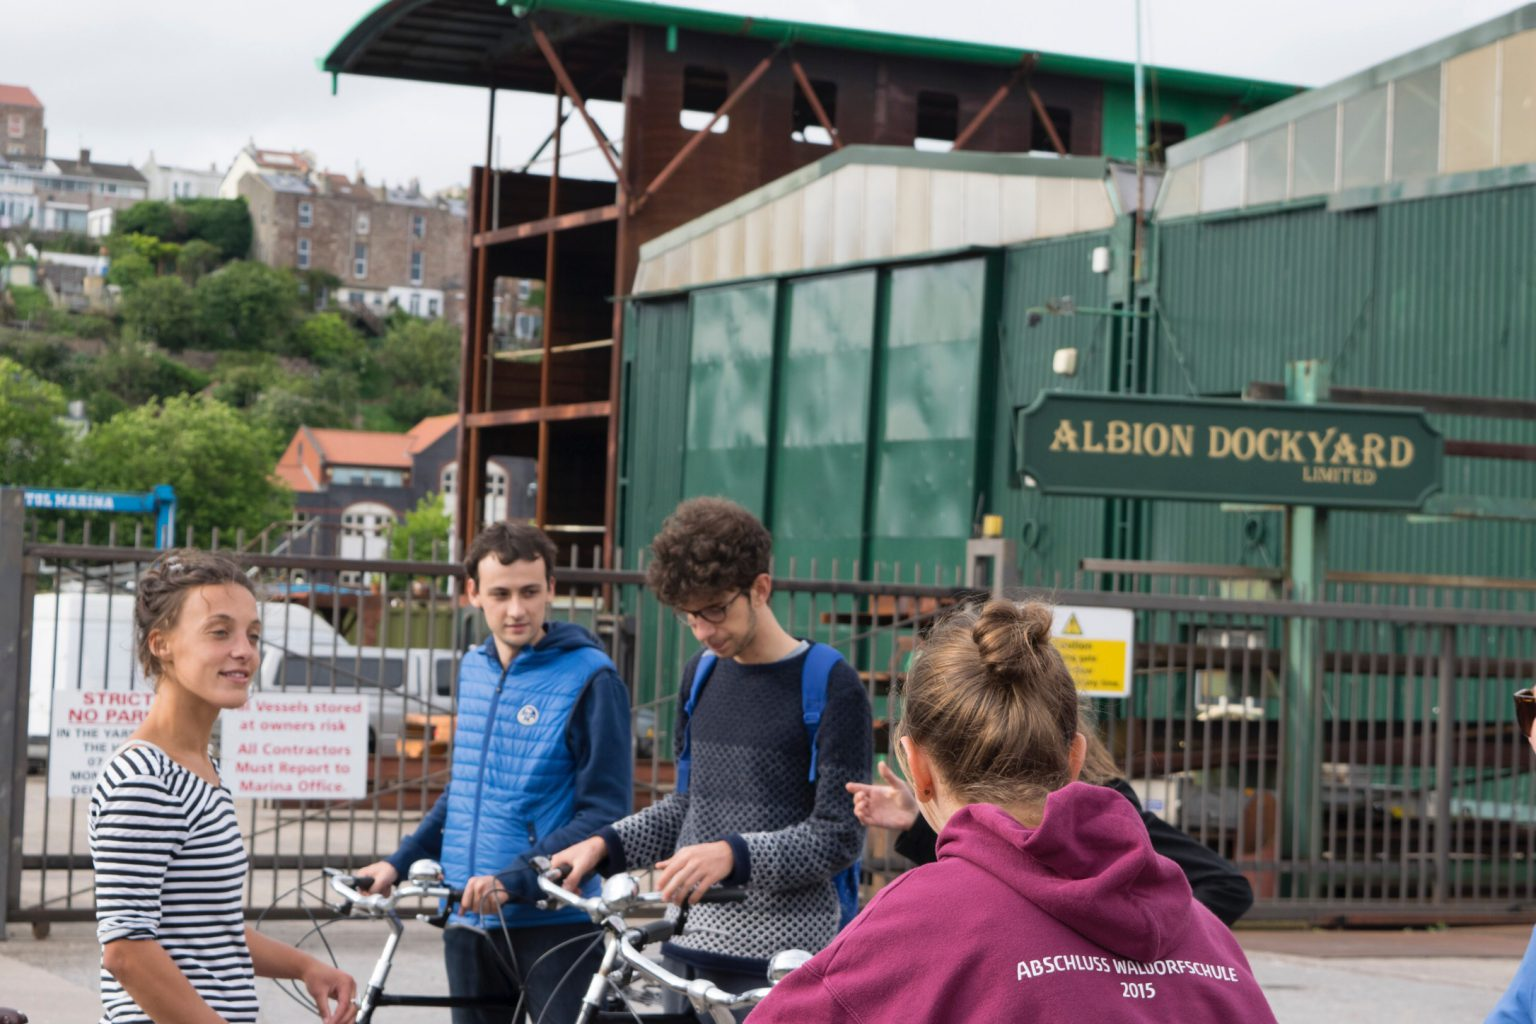 Bristol's better by bike